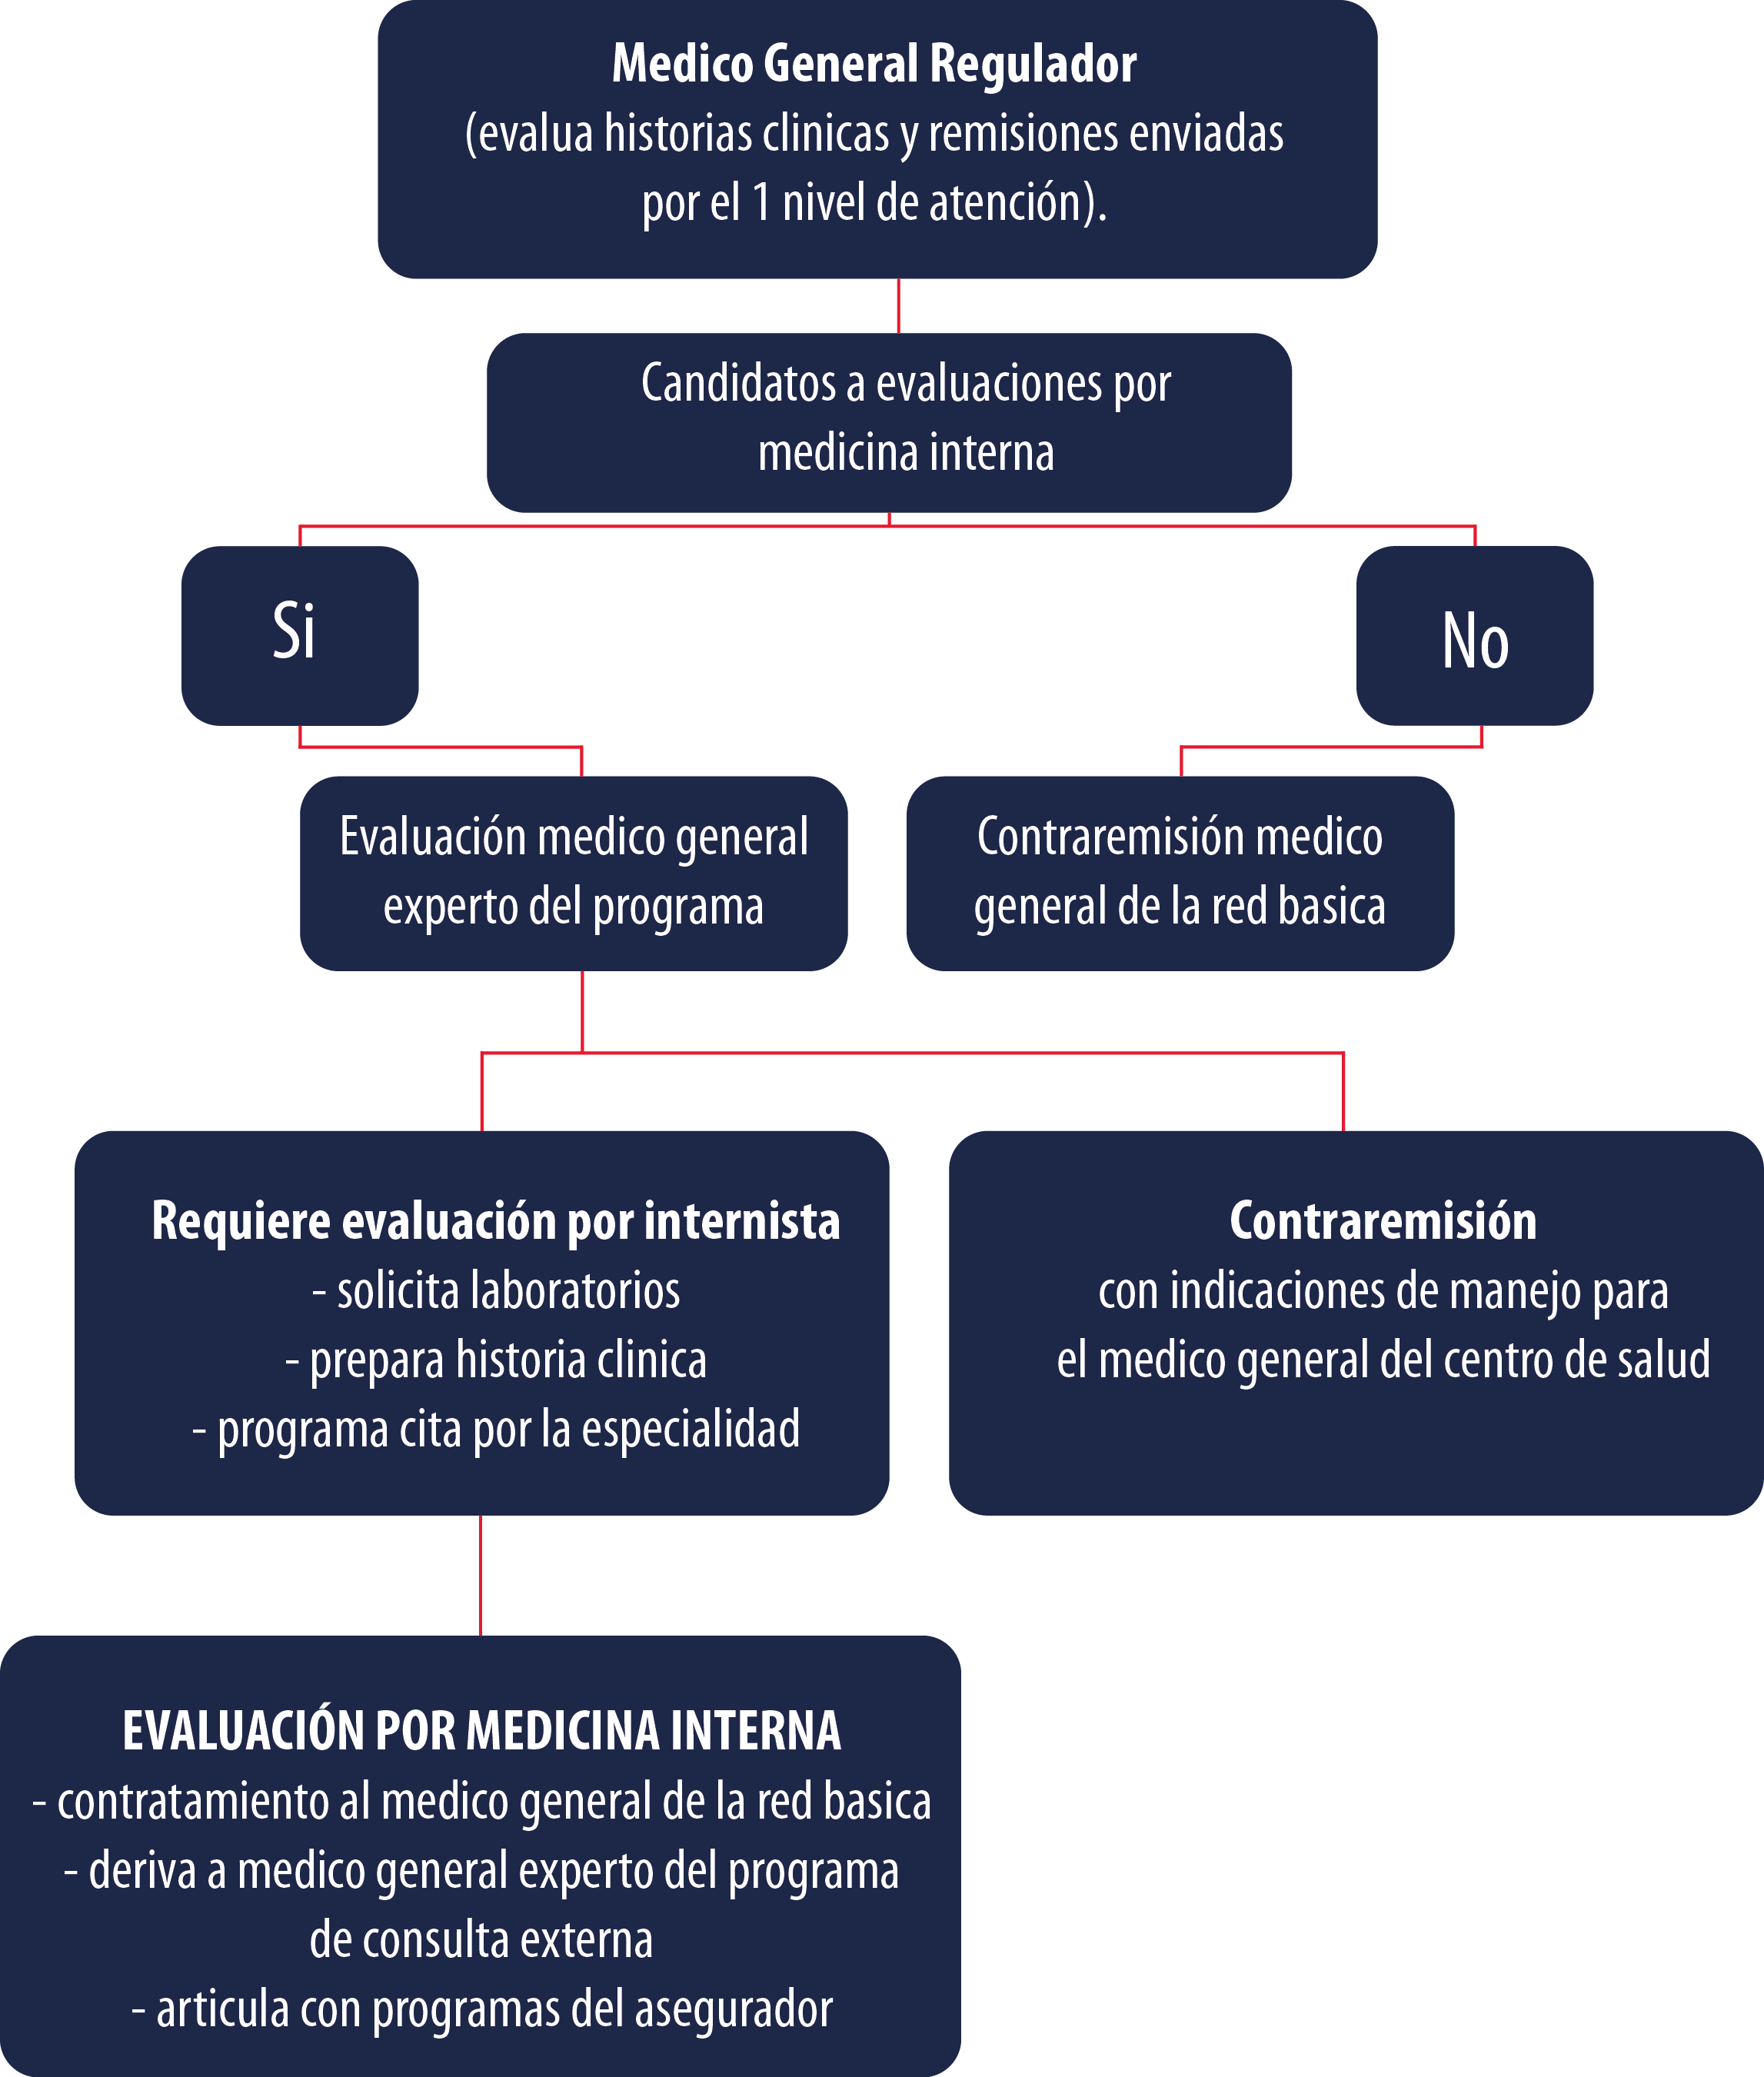 ARTMEDICA inducción on emaze